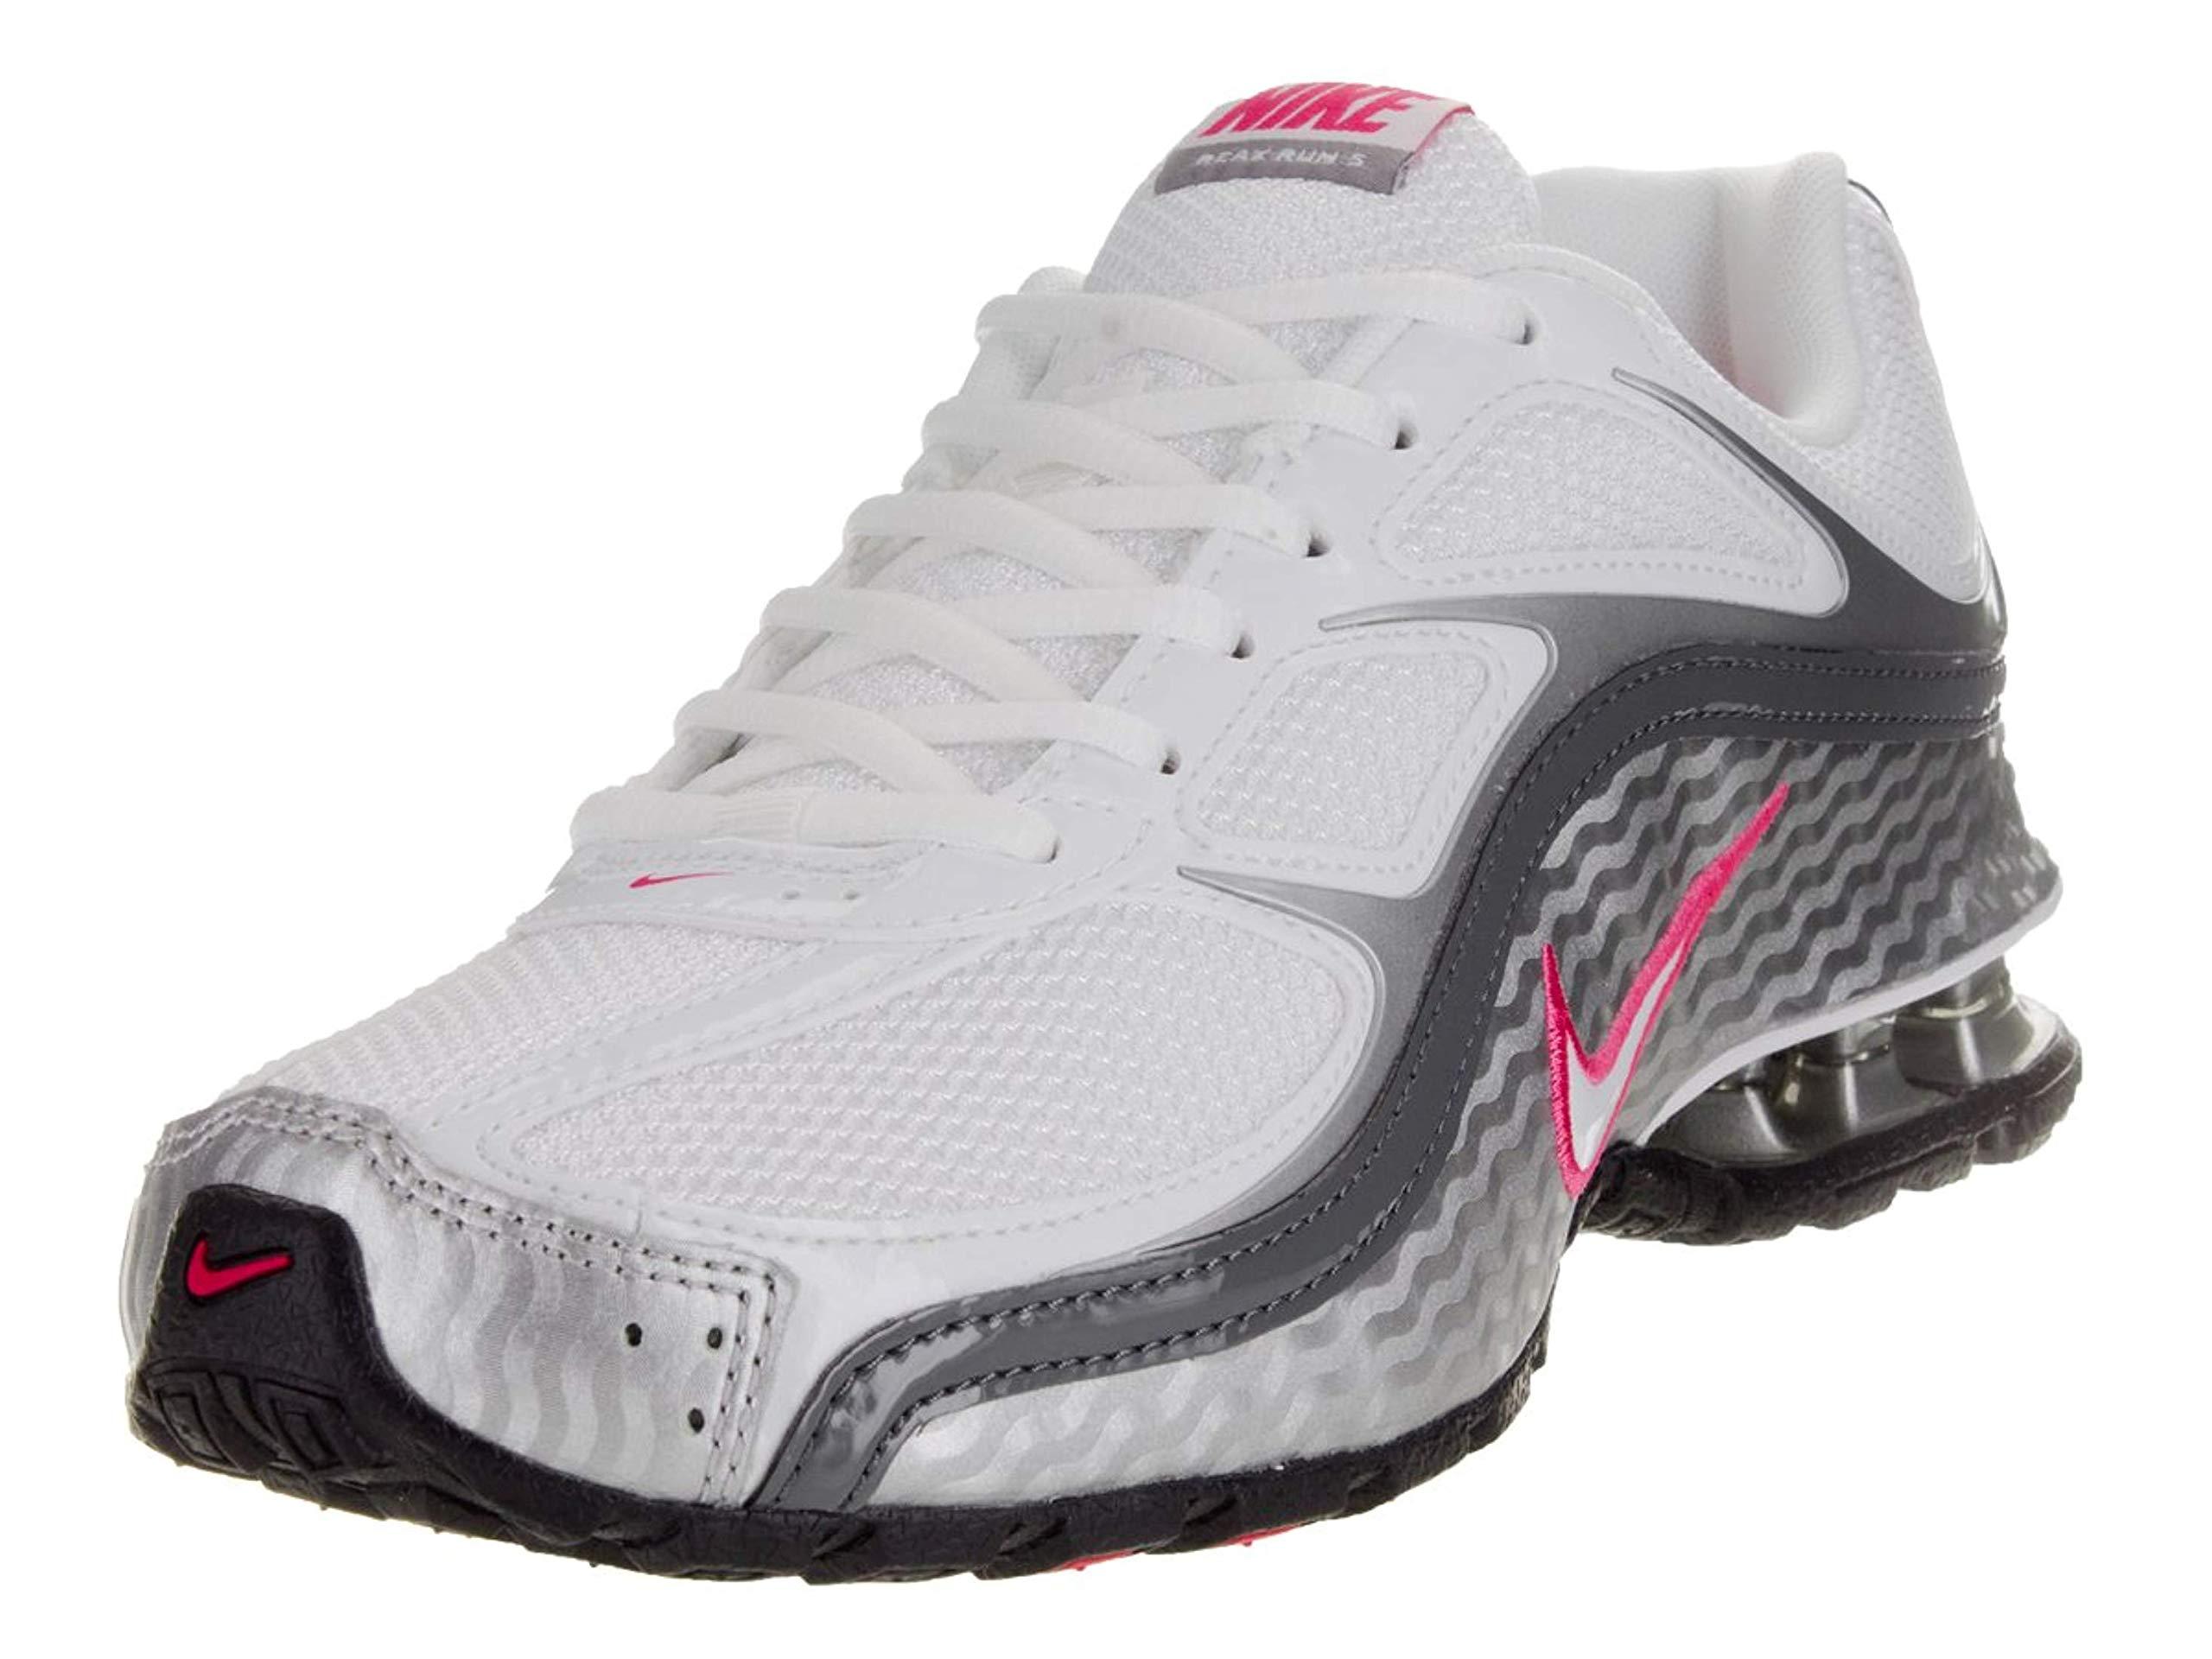 Nike Women's Reax Run 5, Running Shoes Size 9. White/Metallic Silver/Dark Grey. by Nike